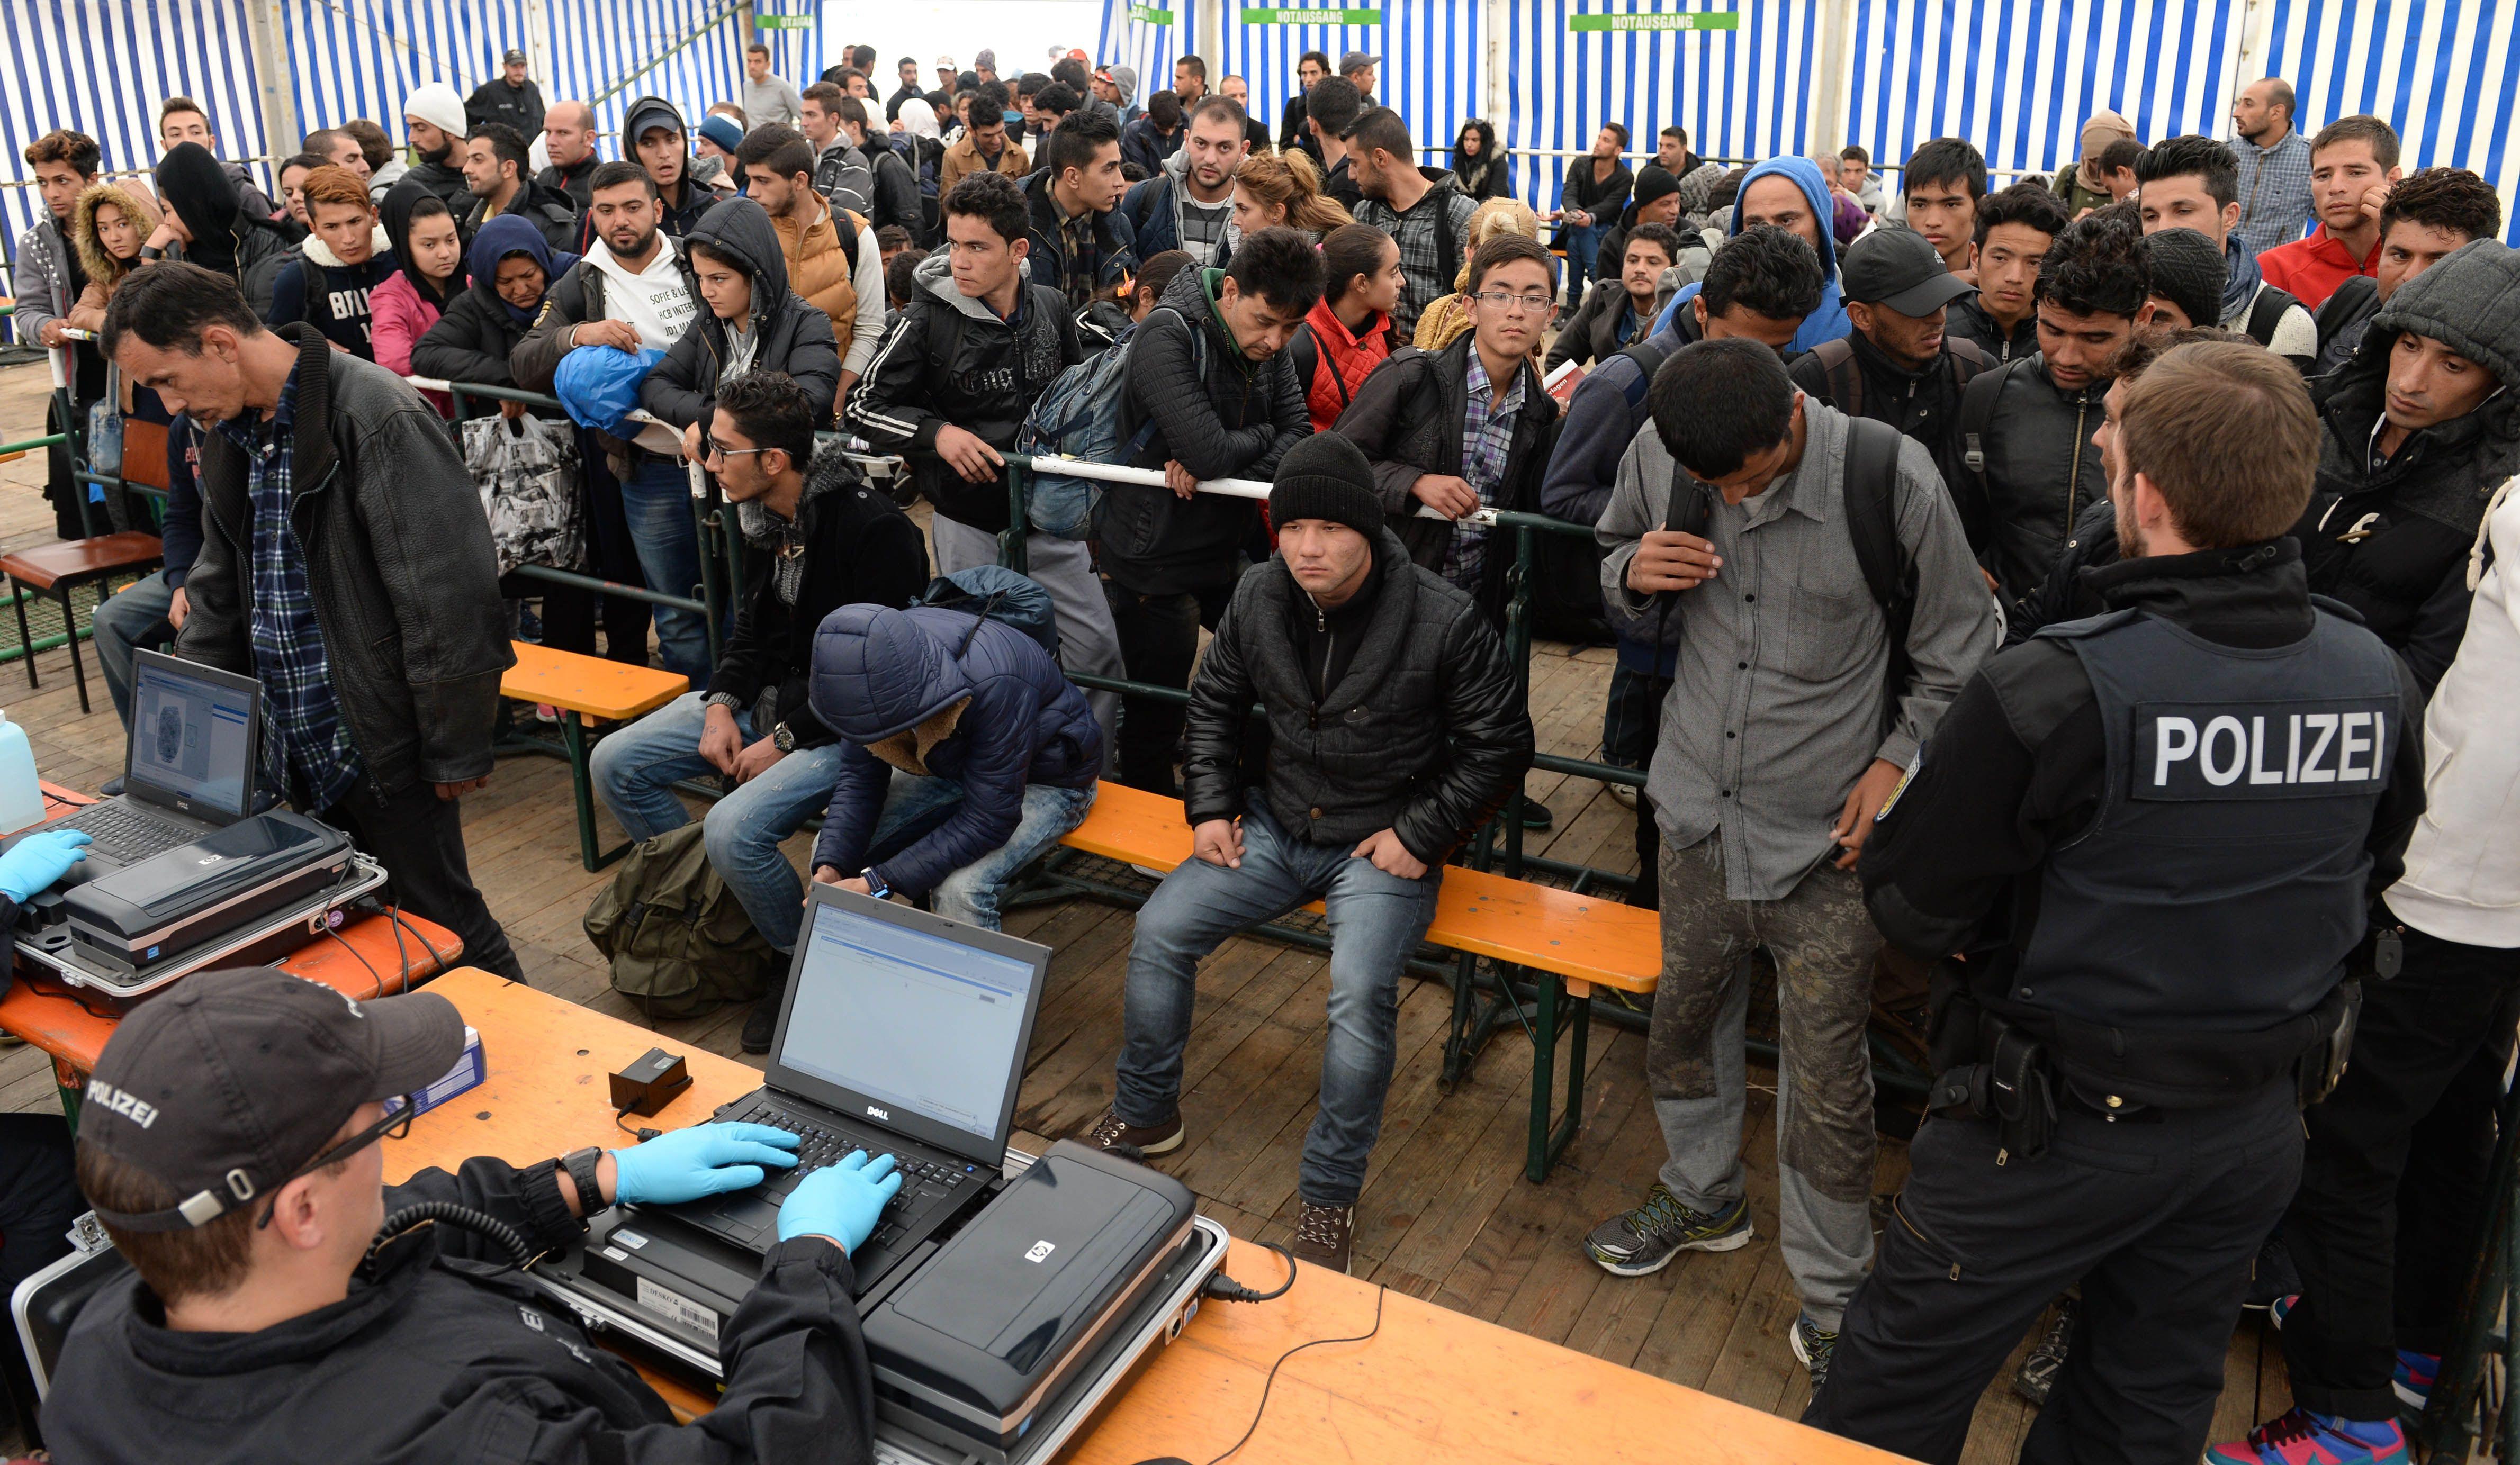 Asylum seekers arriving in Passau in southern Germany (8 Oct)